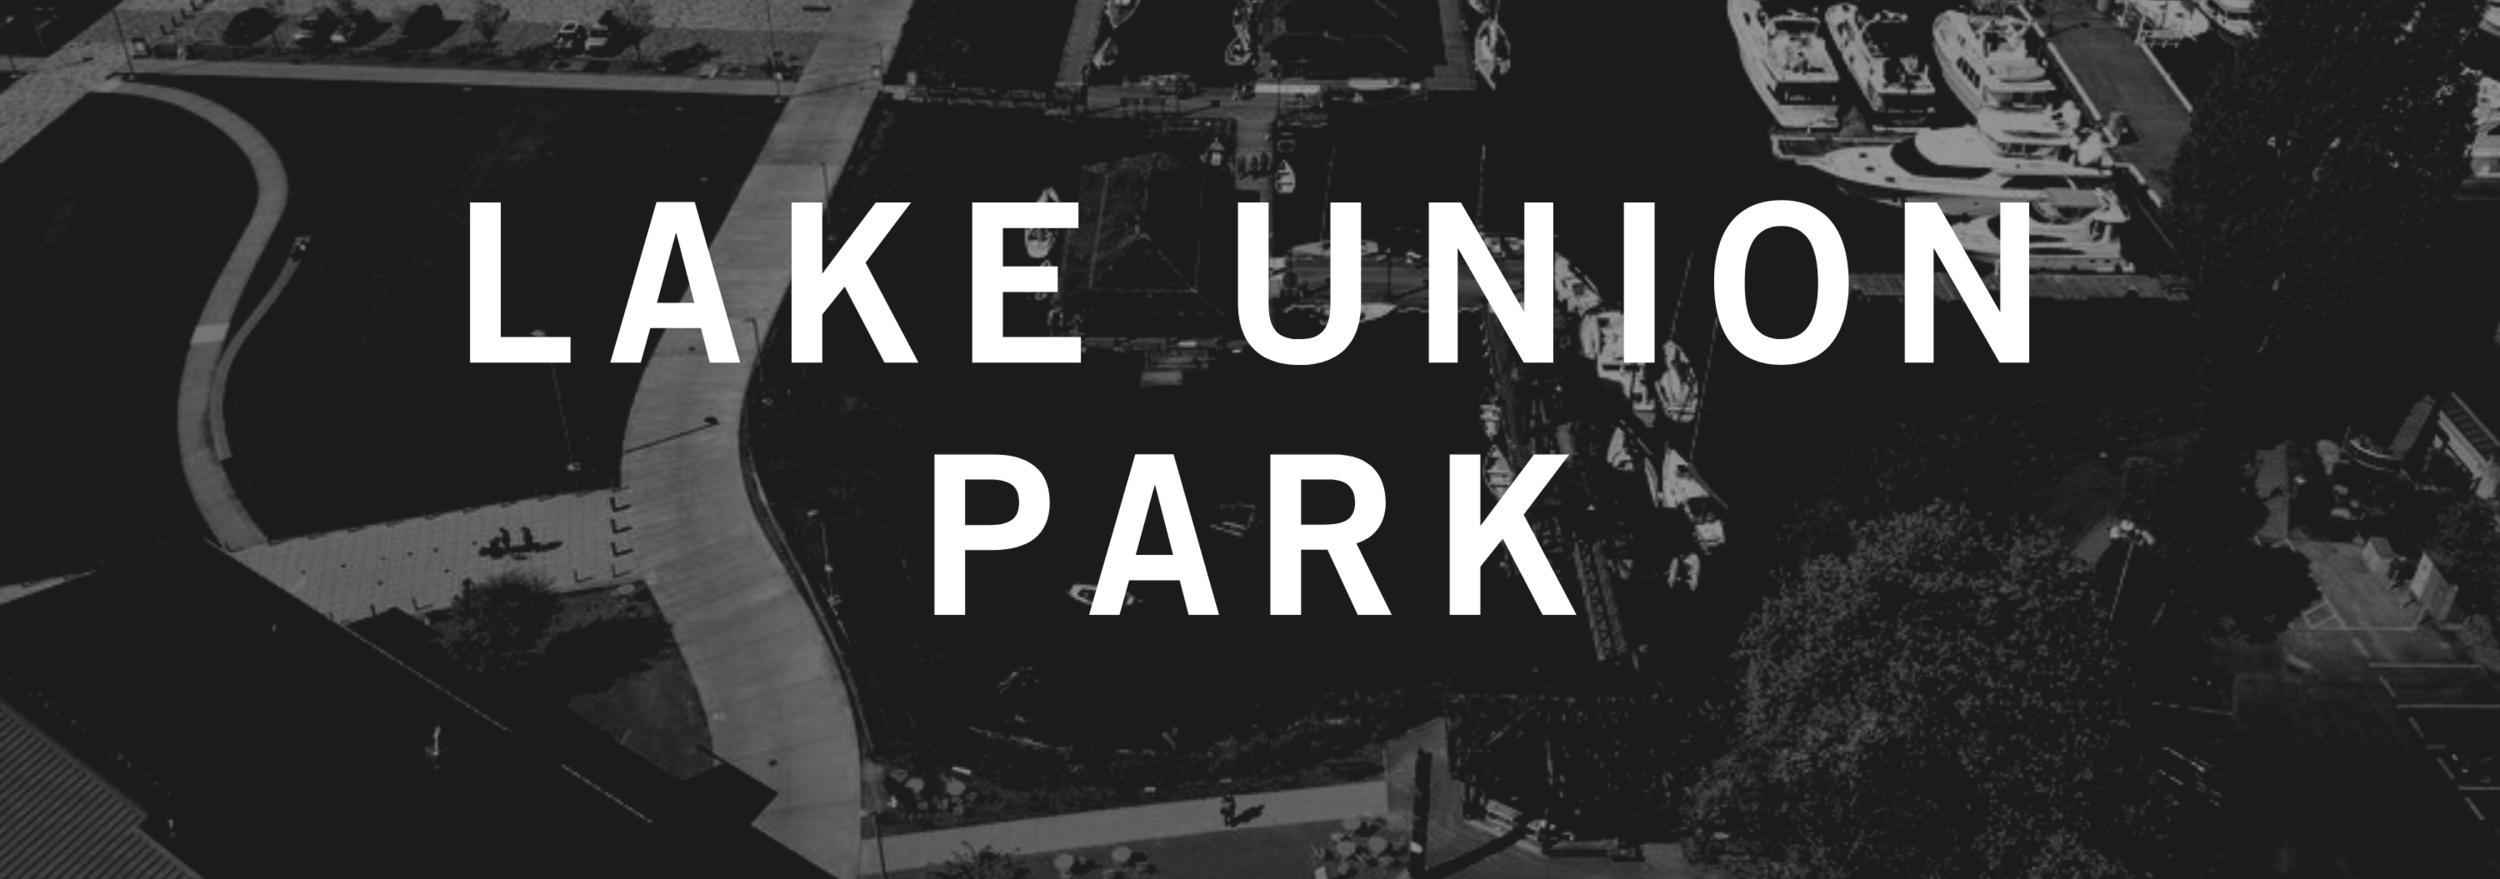 Lake Union Park Festival Banner.png